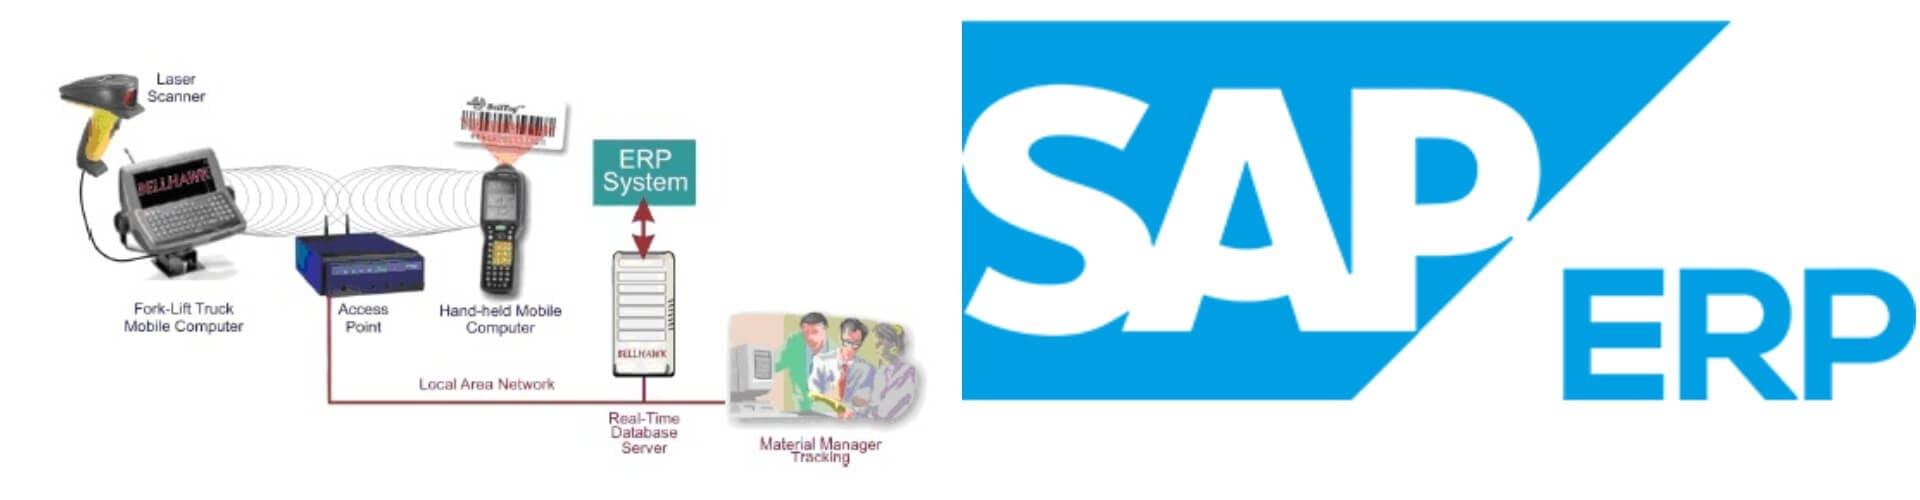 erp integration services